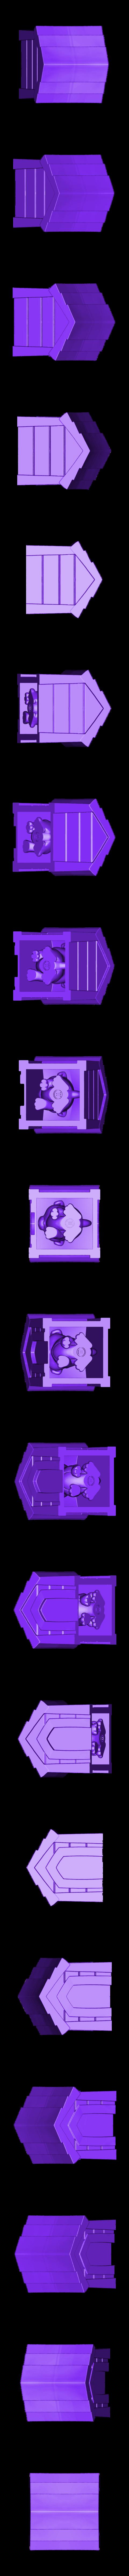 MP_NikoThePuppy.stl Download free STL file Niko the Puppy • 3D printable design, MagicEddy